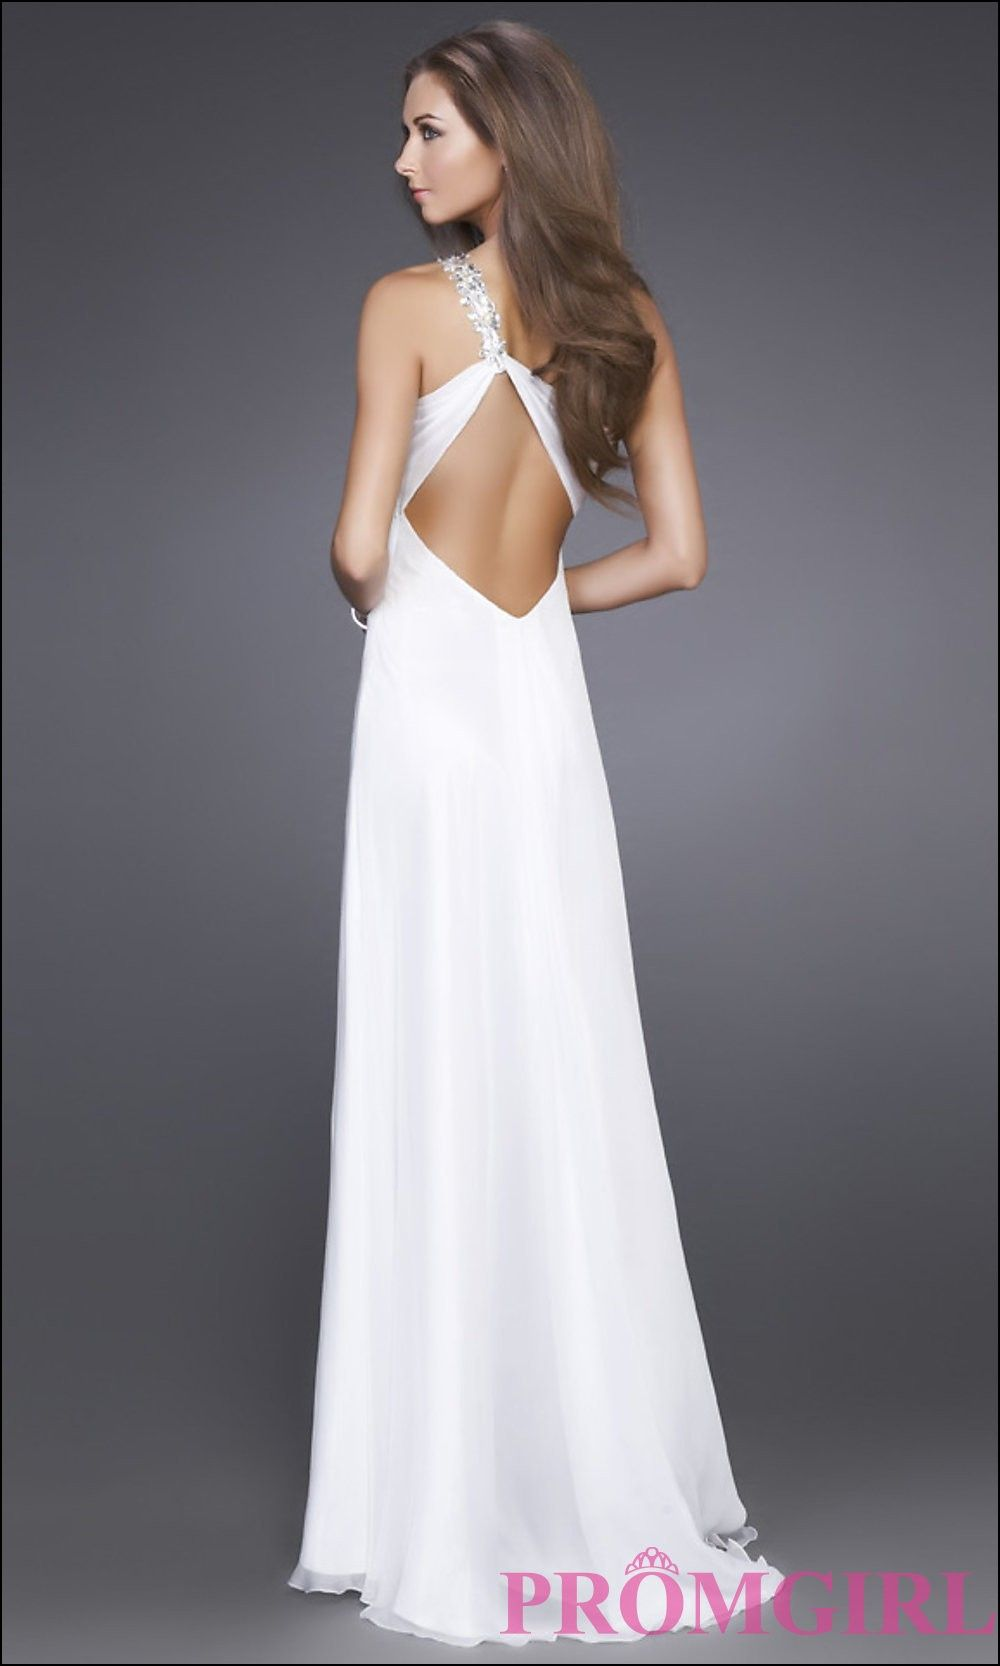 White Dinner Gown | Dresses and Gowns Ideas | Pinterest | Dinner ...